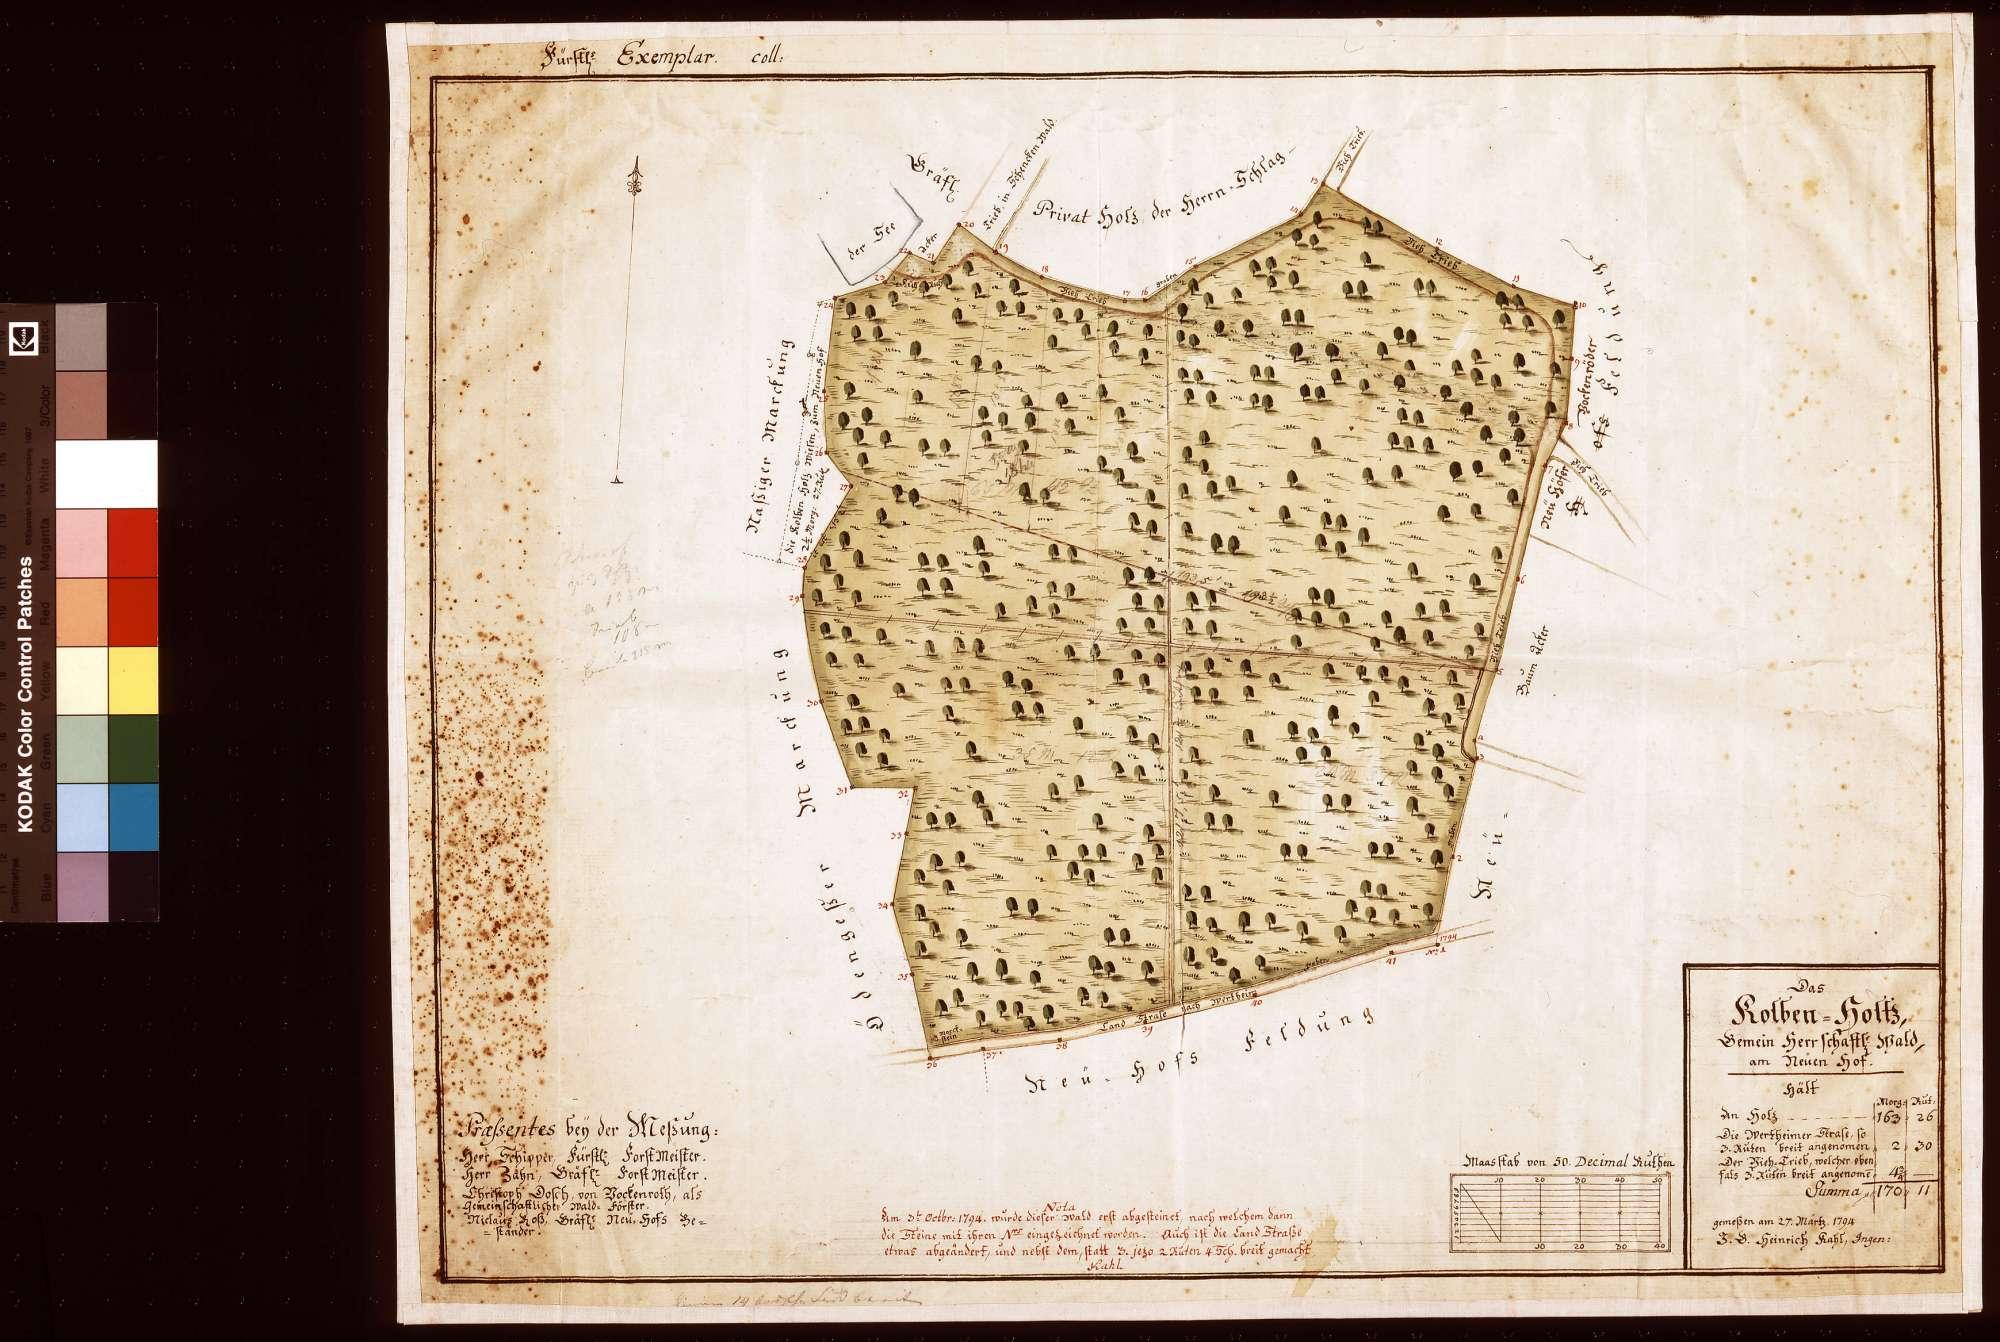 Kolbenholtz: gemeinschaftlicher Wald am Neuen Hof (Inselkarte), Bild 1